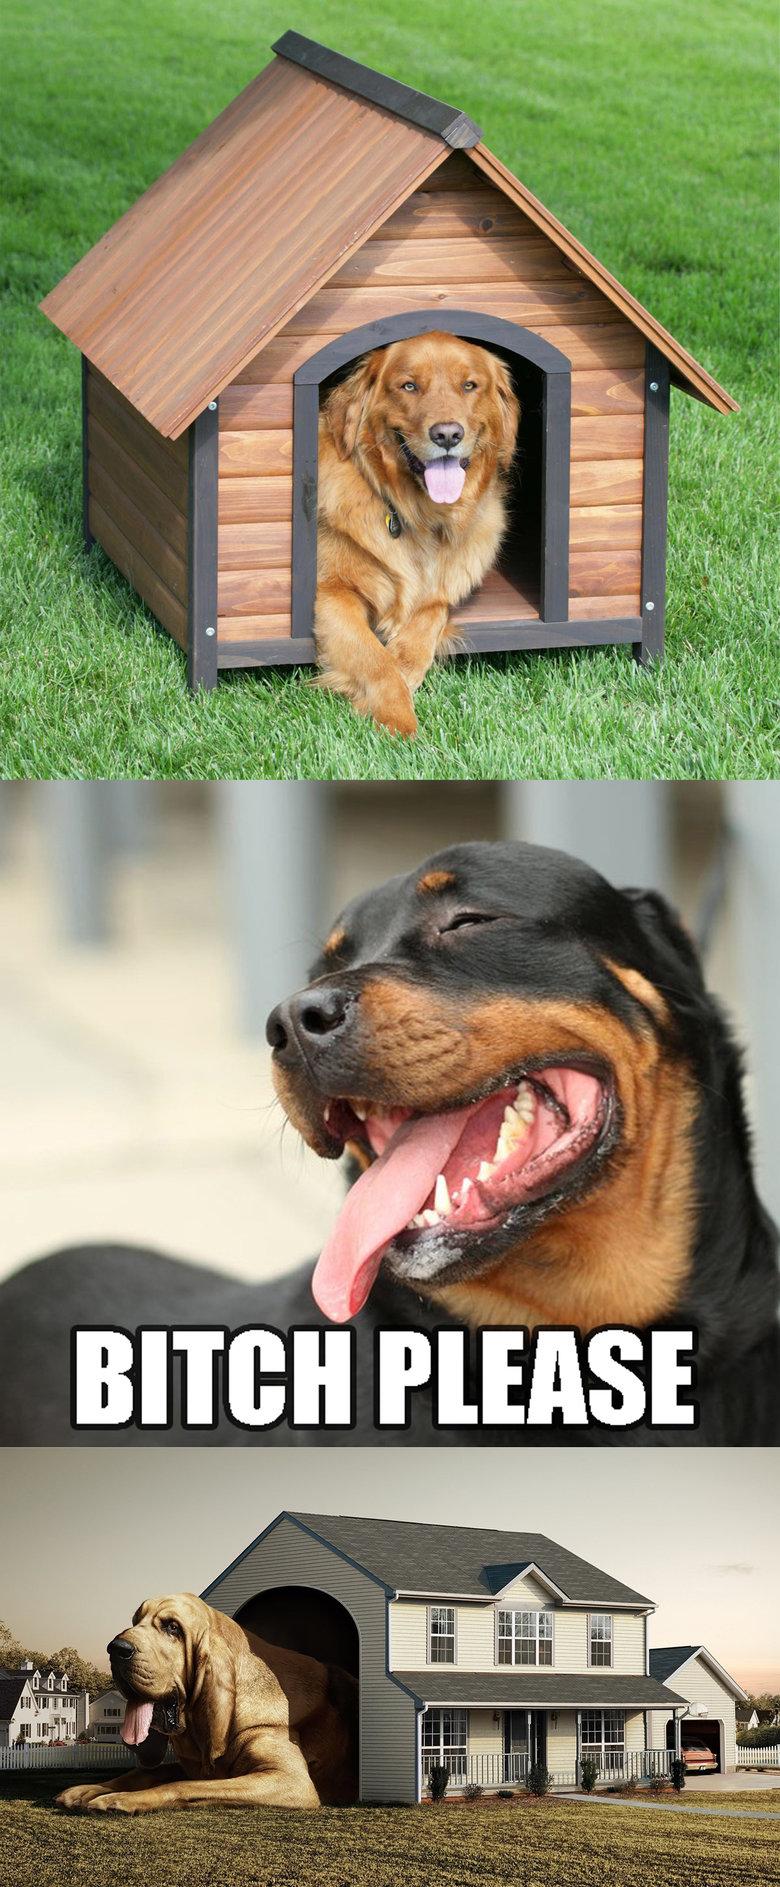 dog please. dog please!! credz buller. Dog pleease bitch please Noob